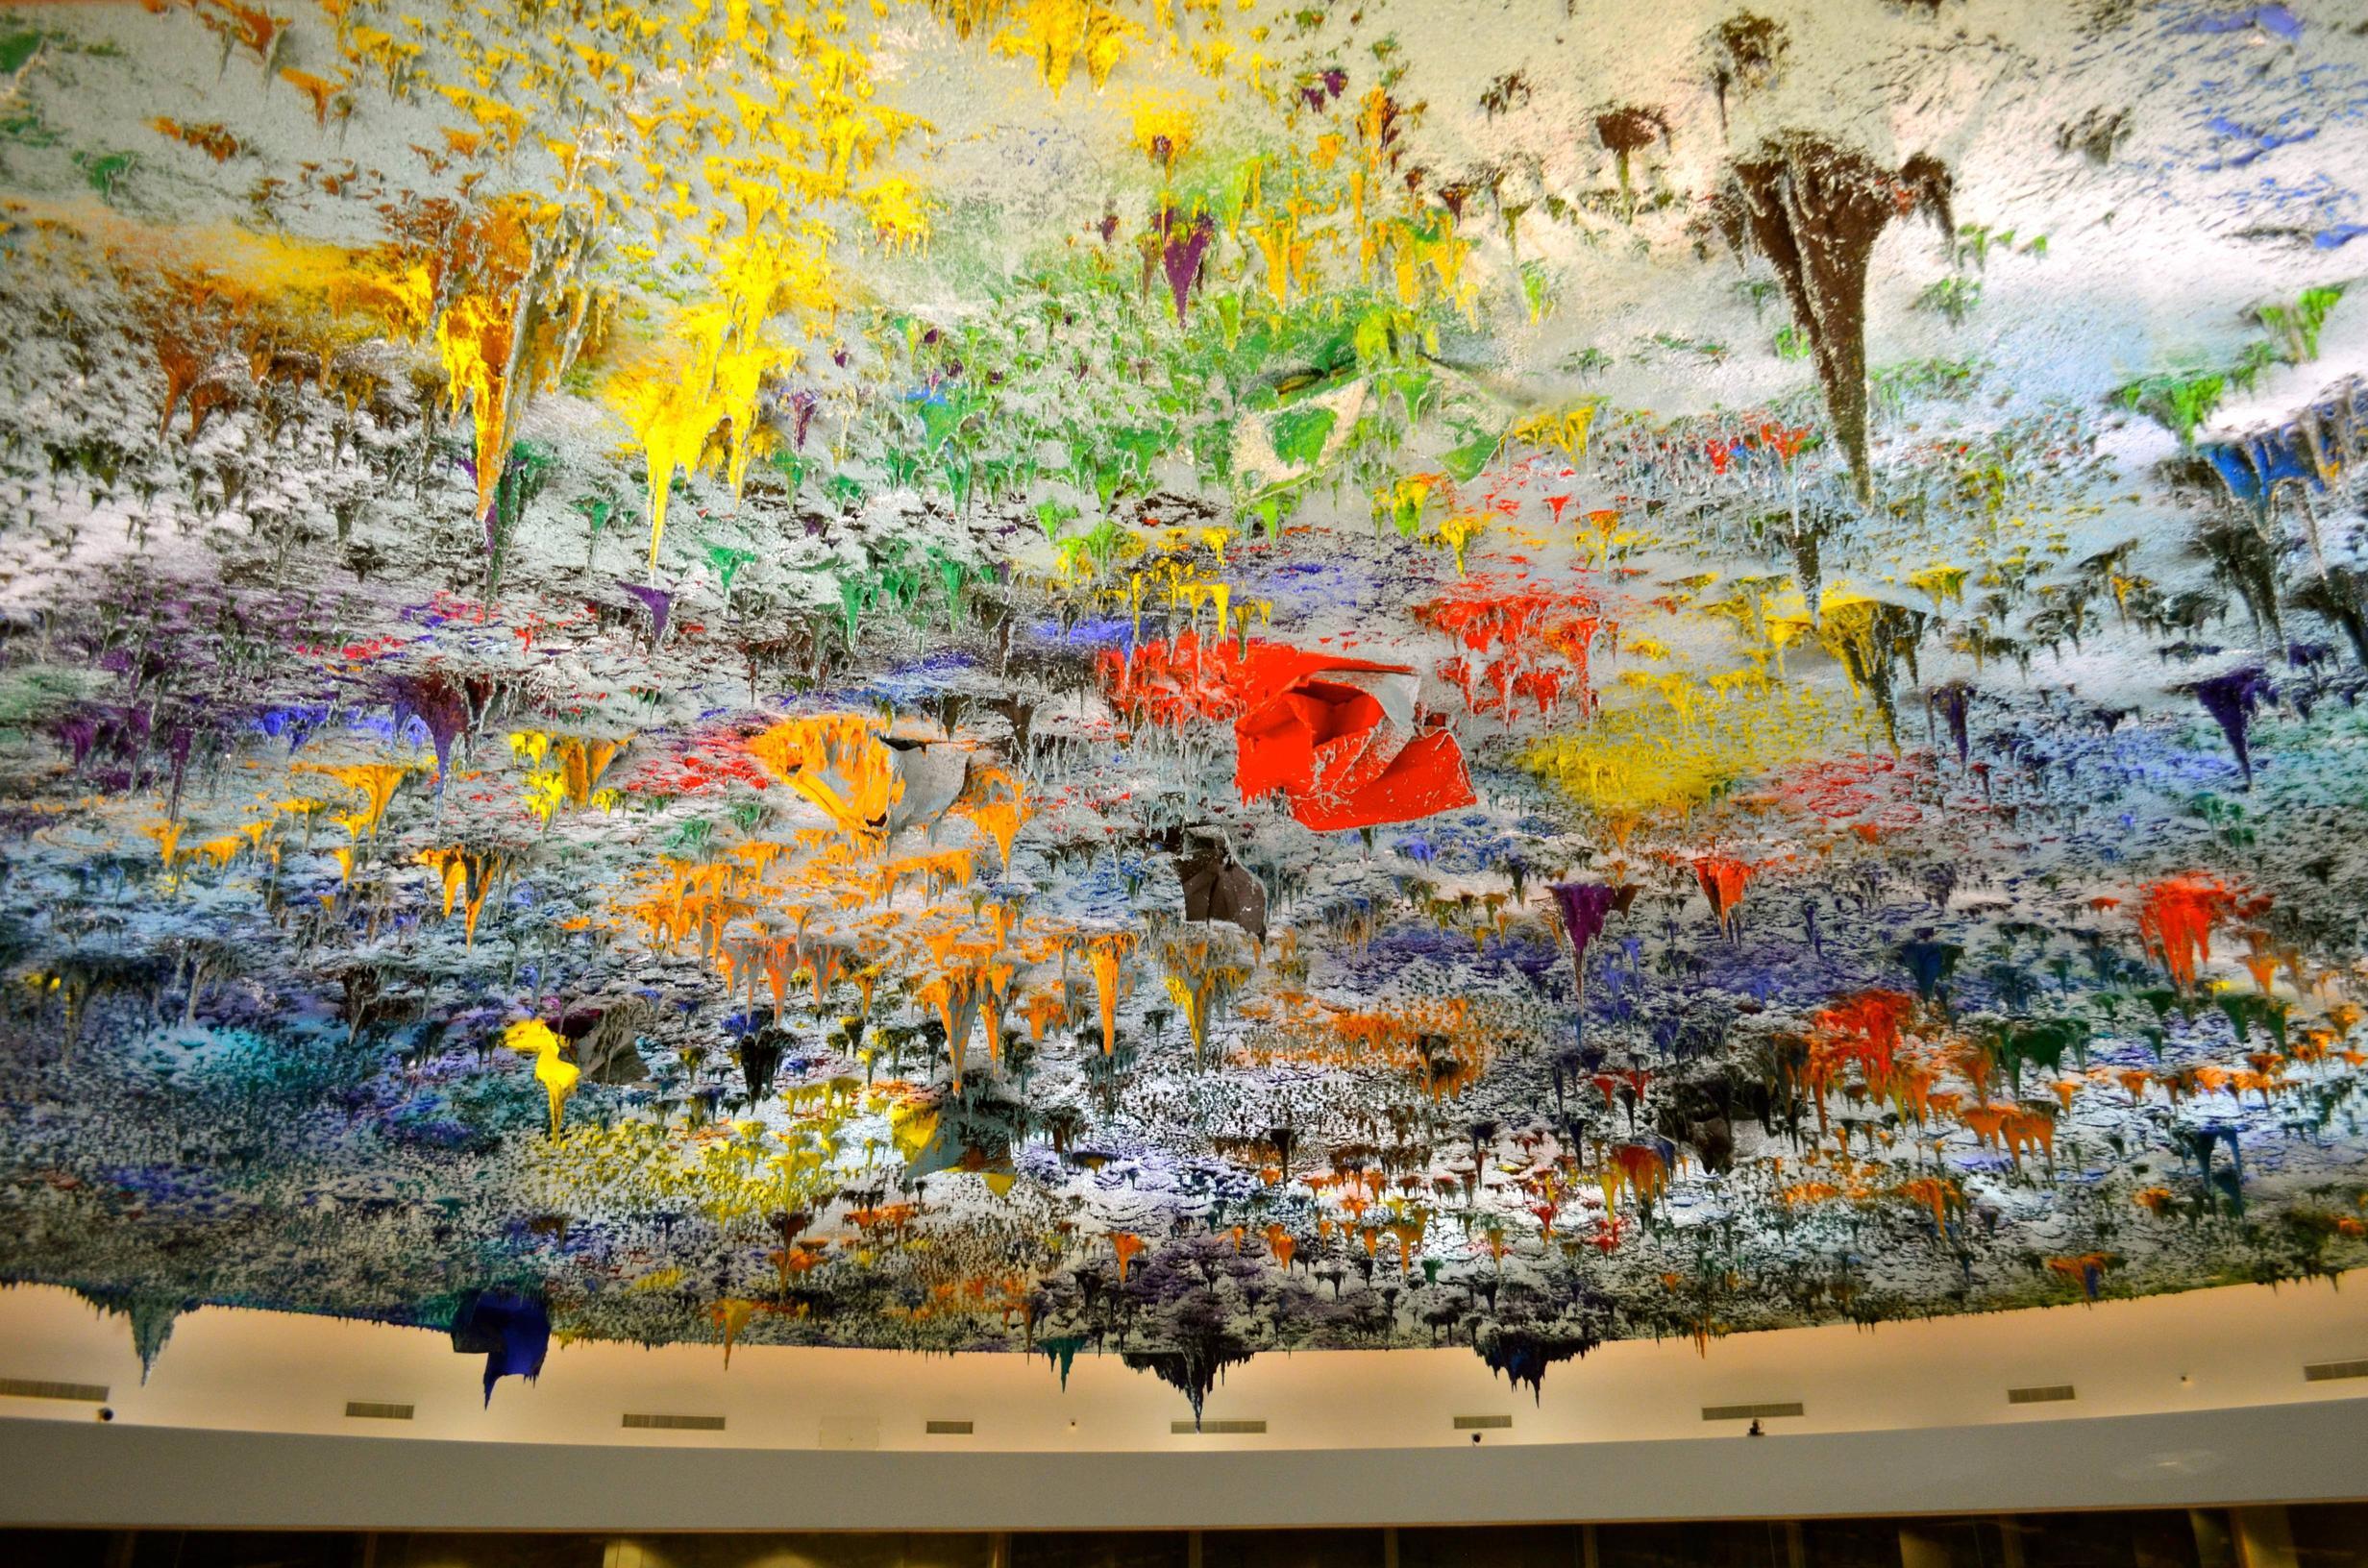 International Human Rights News: Weekly Roundup